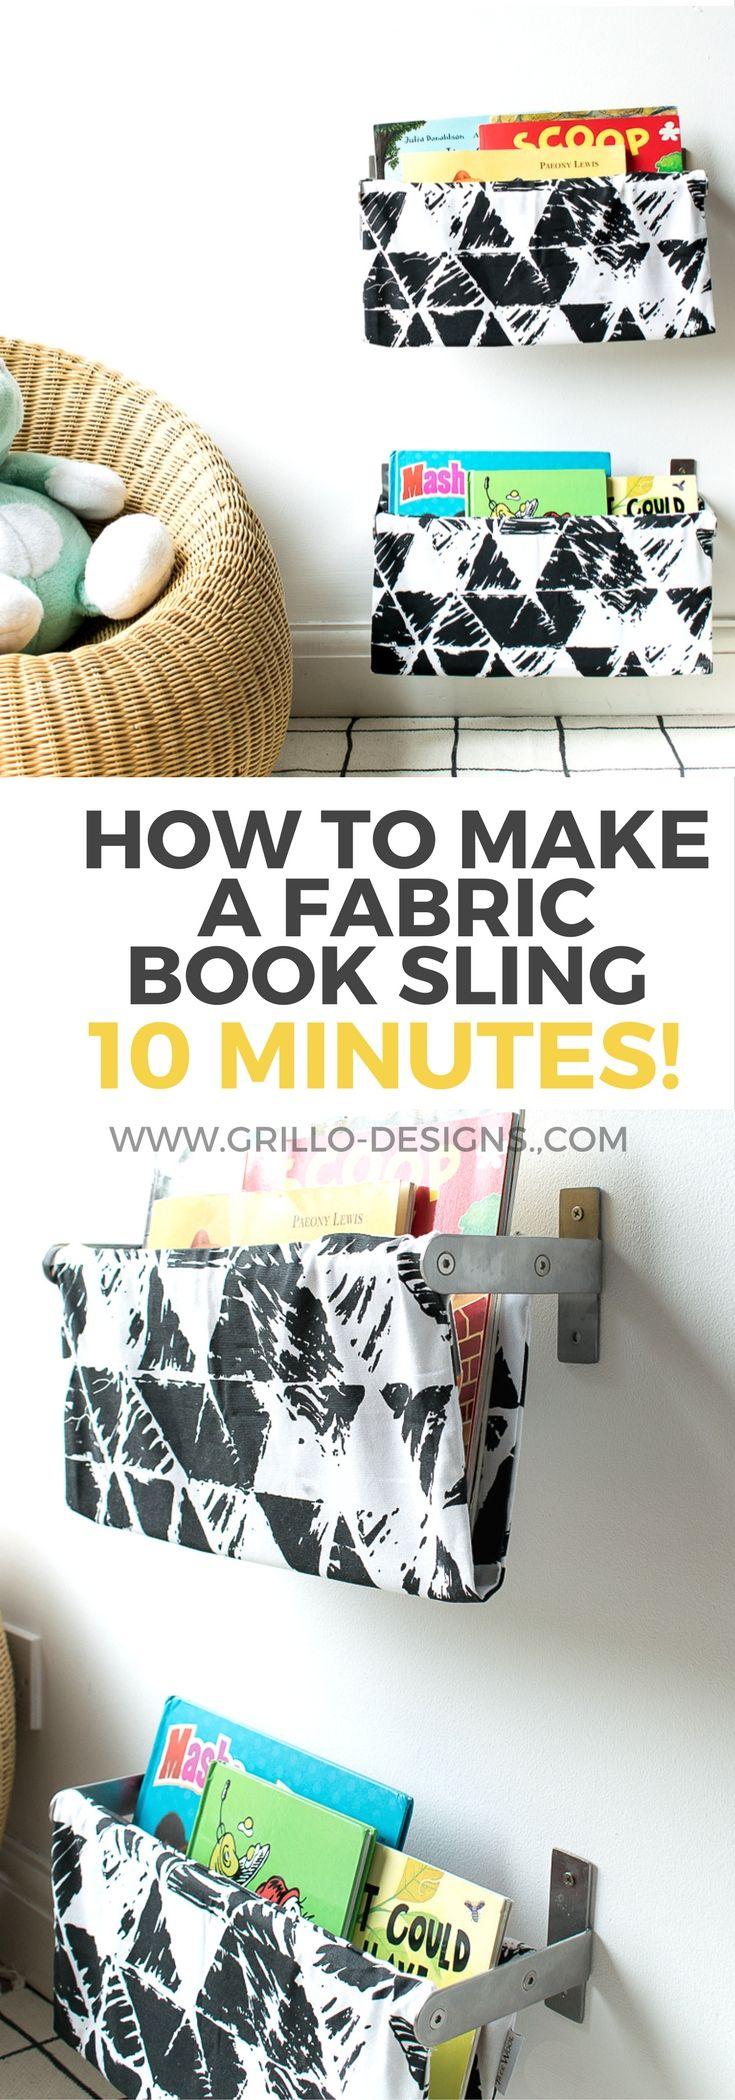 IKEA GRUNDTAL HACK: FABRIC BOOK SLING TUTORIAL